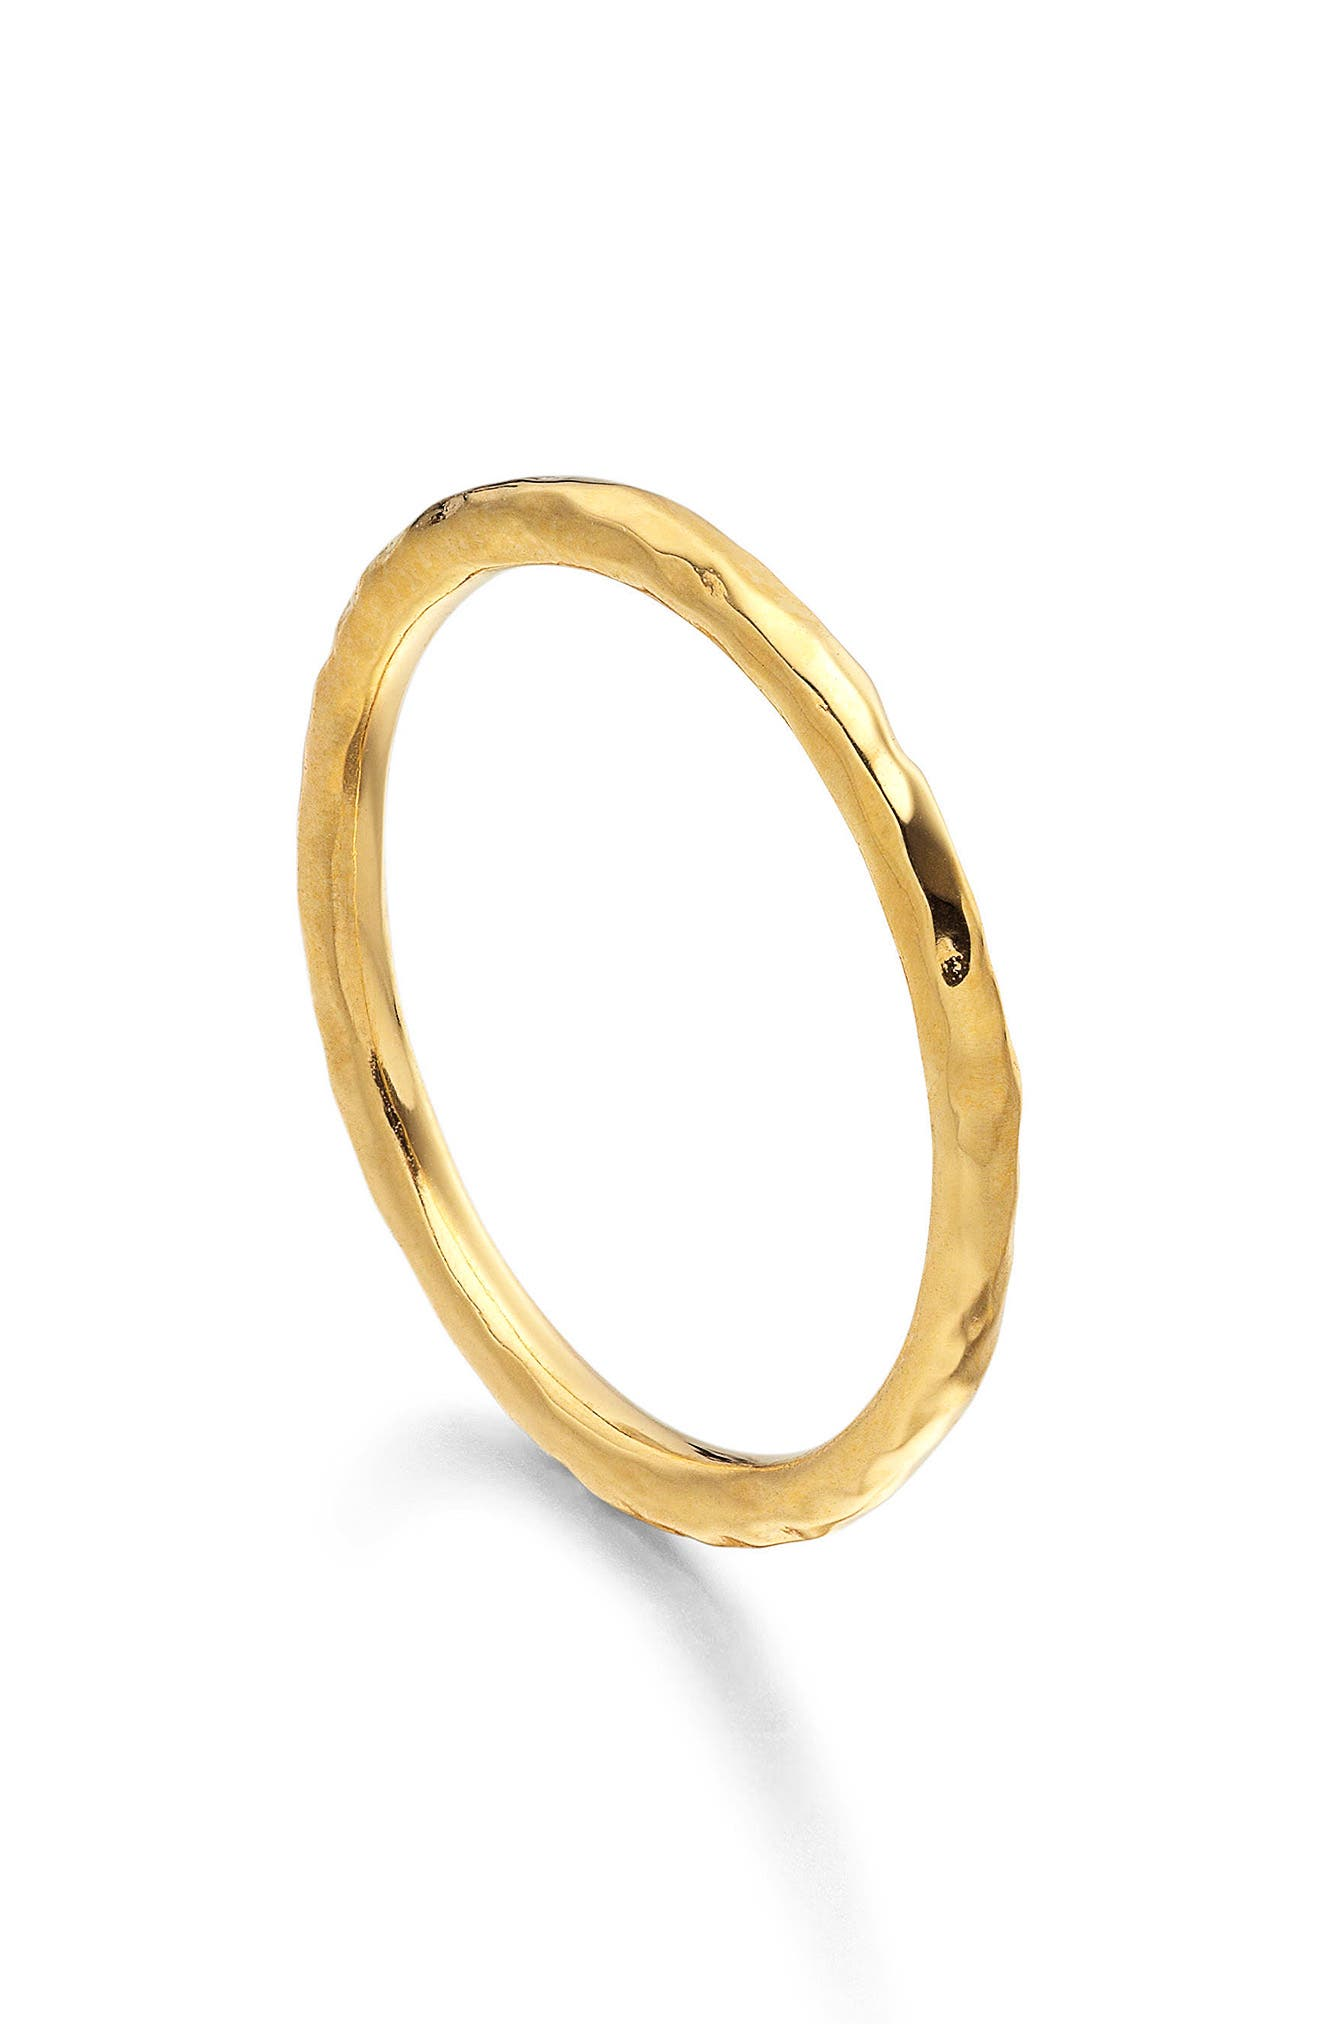 Siren Hammered Ring,                             Alternate thumbnail 2, color,                             GOLD